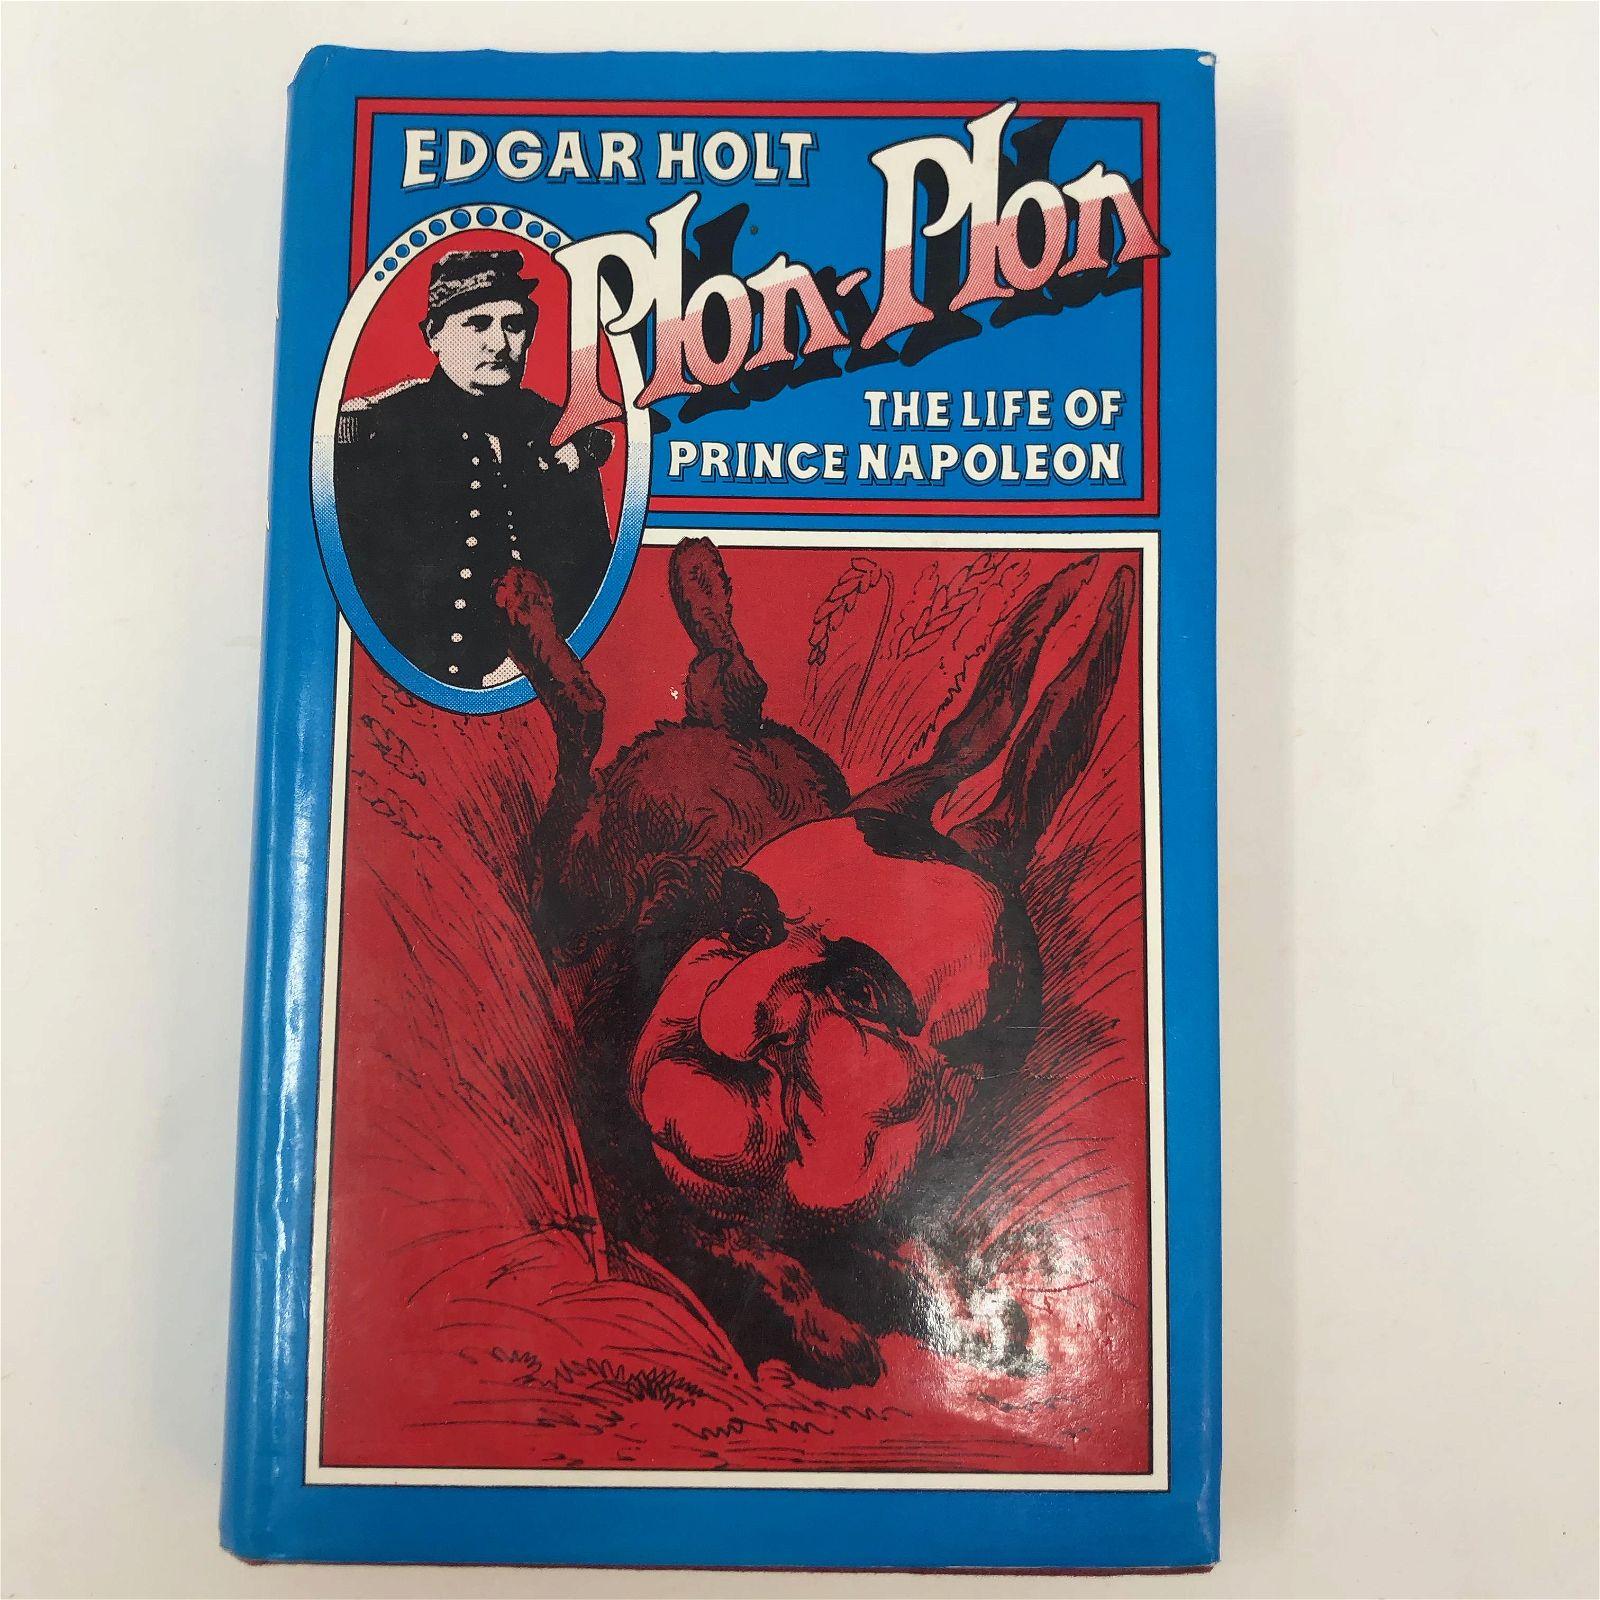 Plon-Plon The Life of Prince Napoleon, EDGAR HOLT, pub: